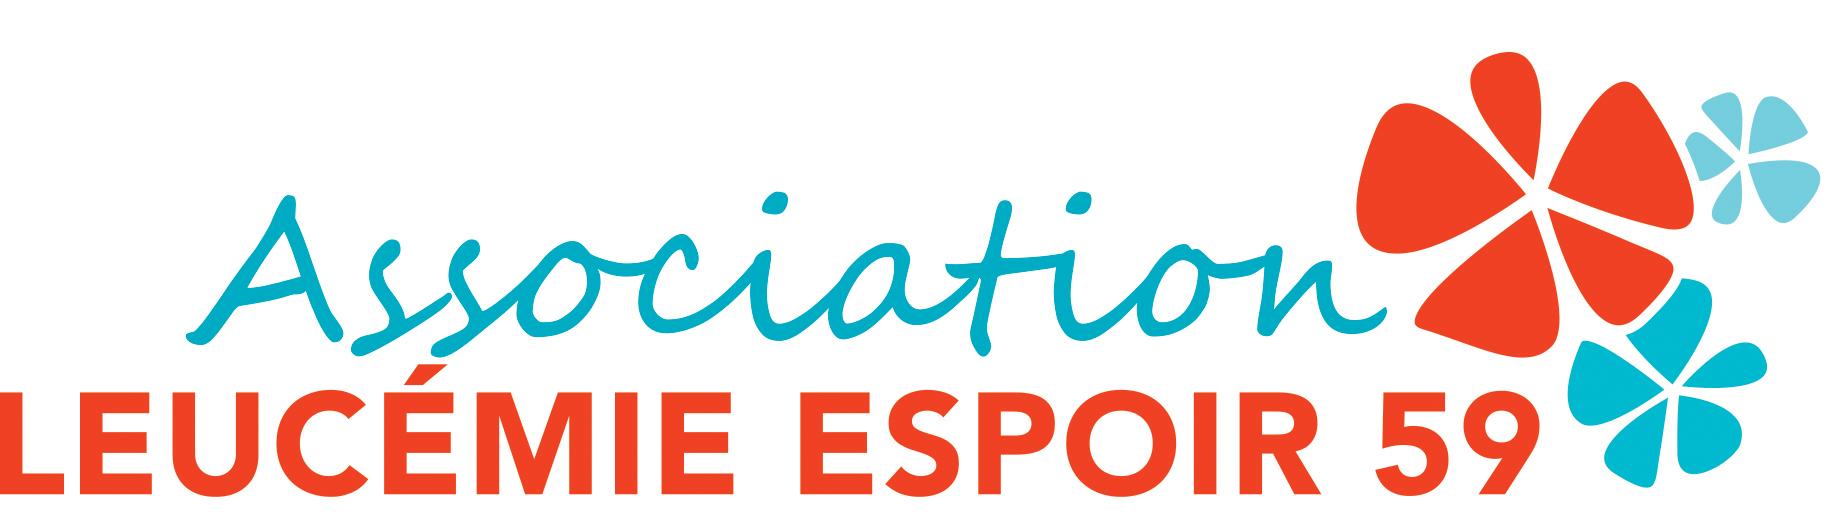 Association Contact association